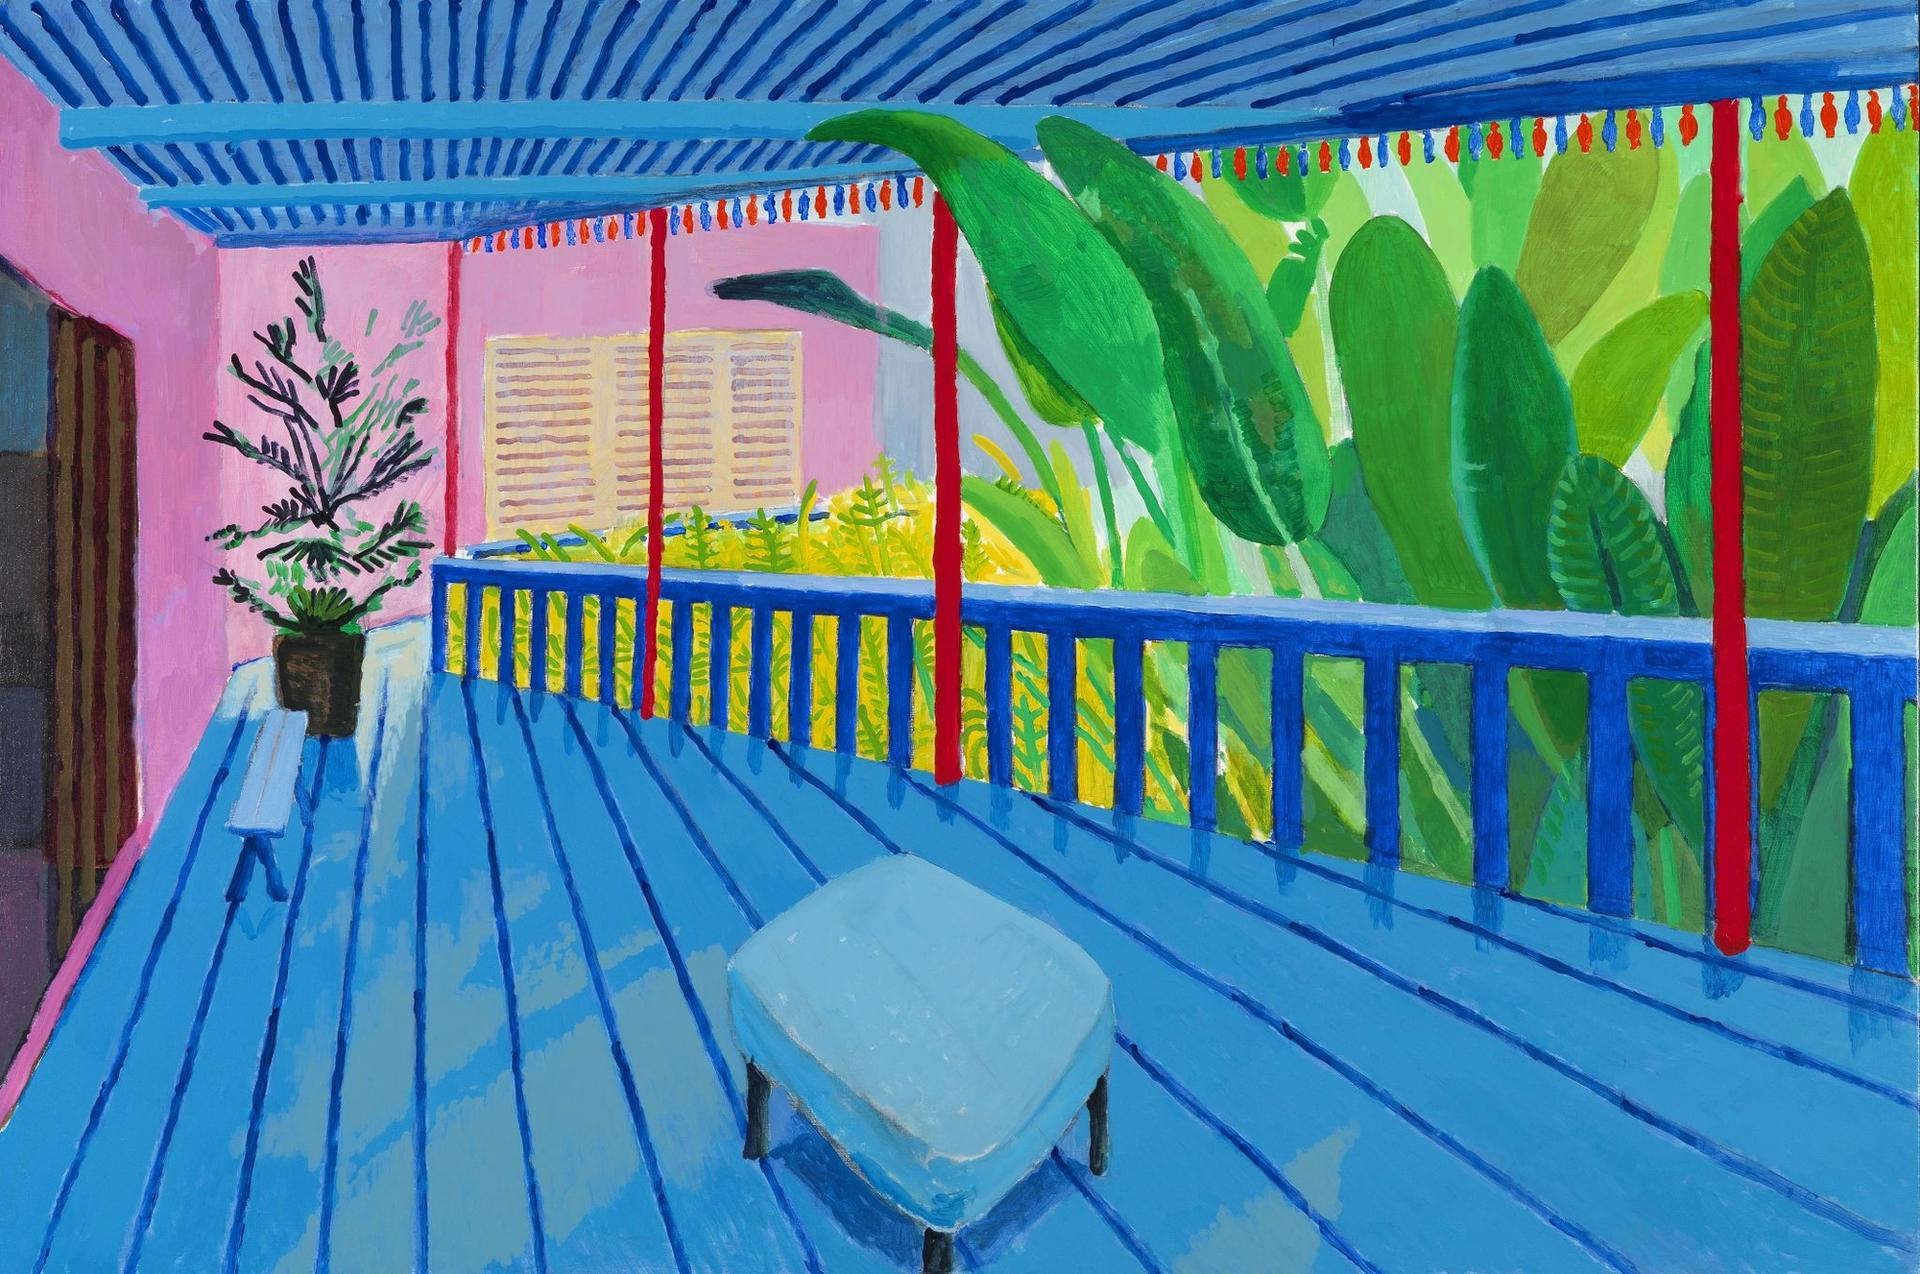 David Hockney's Garden with Blue Terrace (2015)